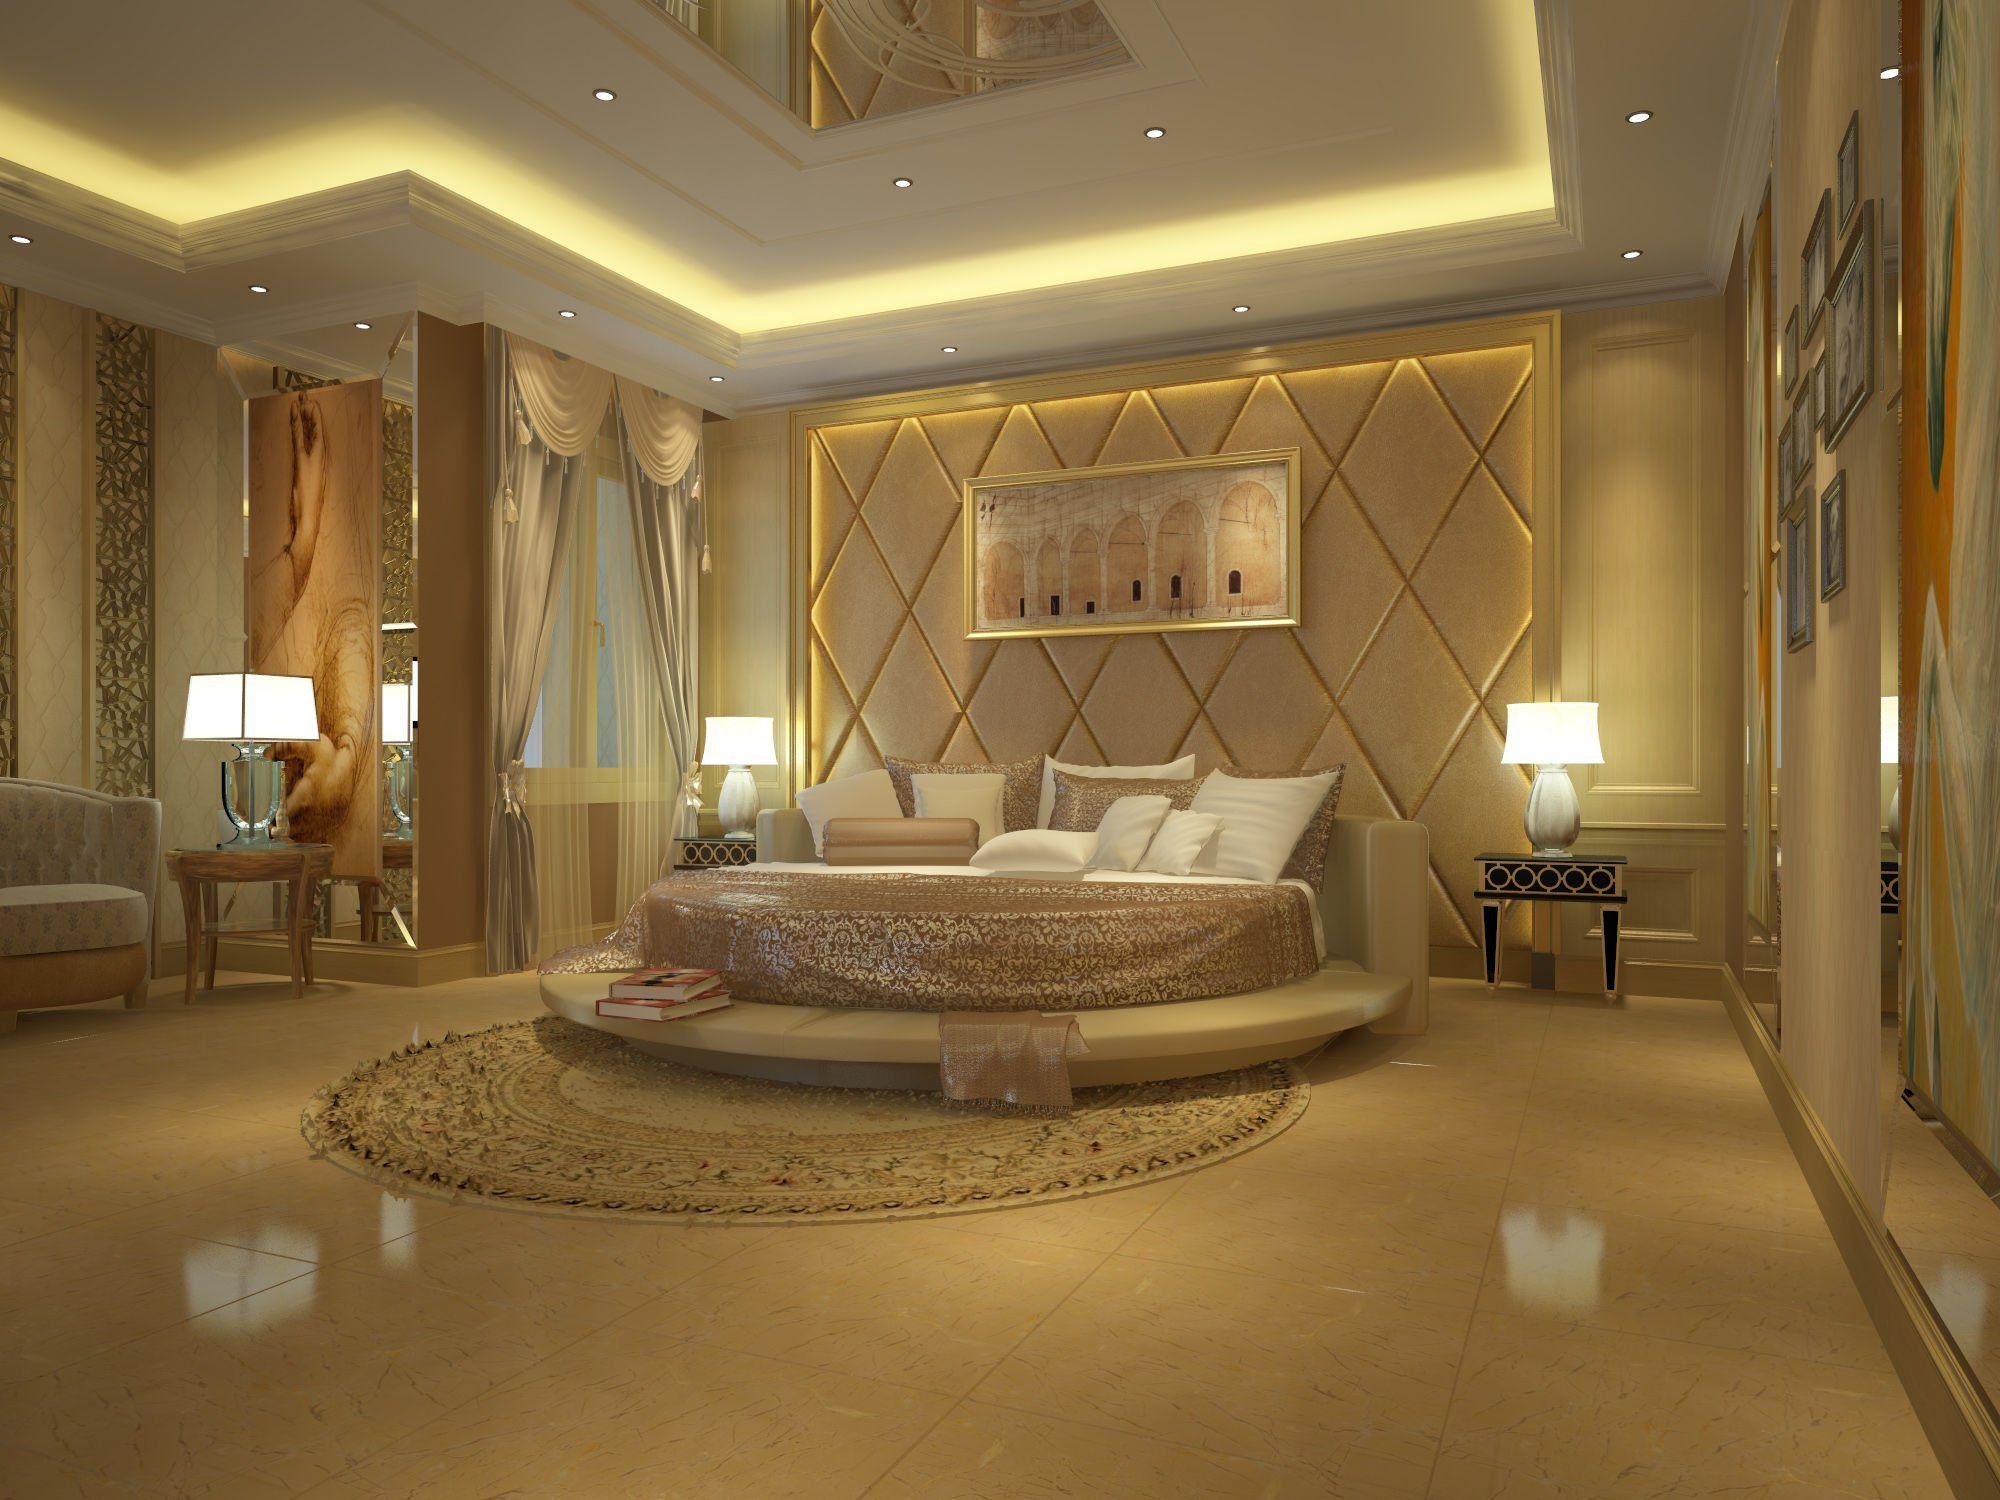 15 Ultra Modern Ceiling Designs For Your Master Bedroom Bedroom